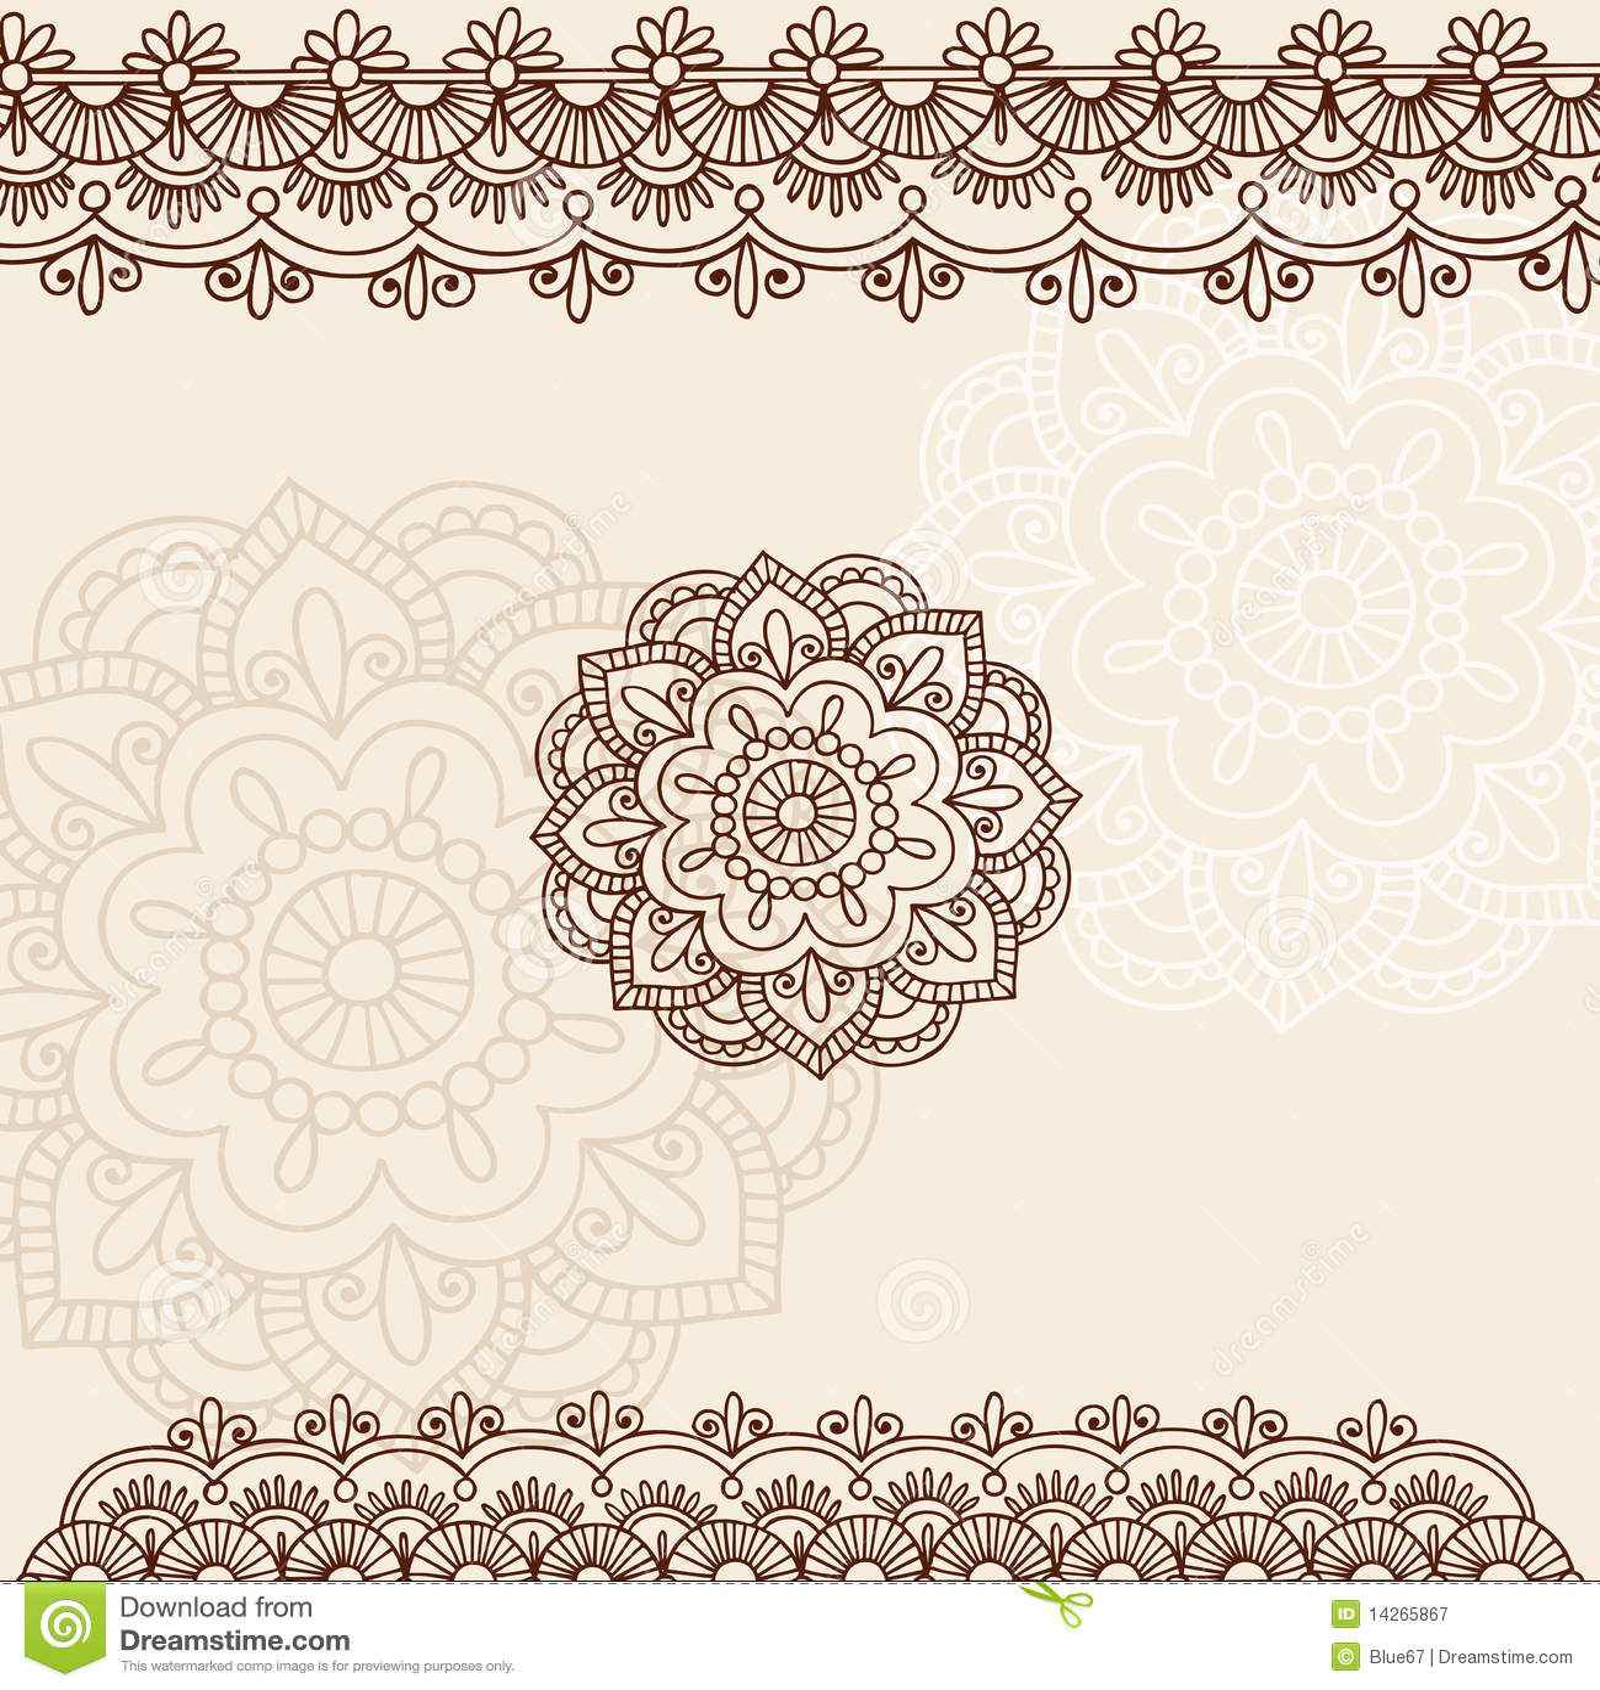 Henna Mehndi Paisley Doodle Vector Design Stock Vector